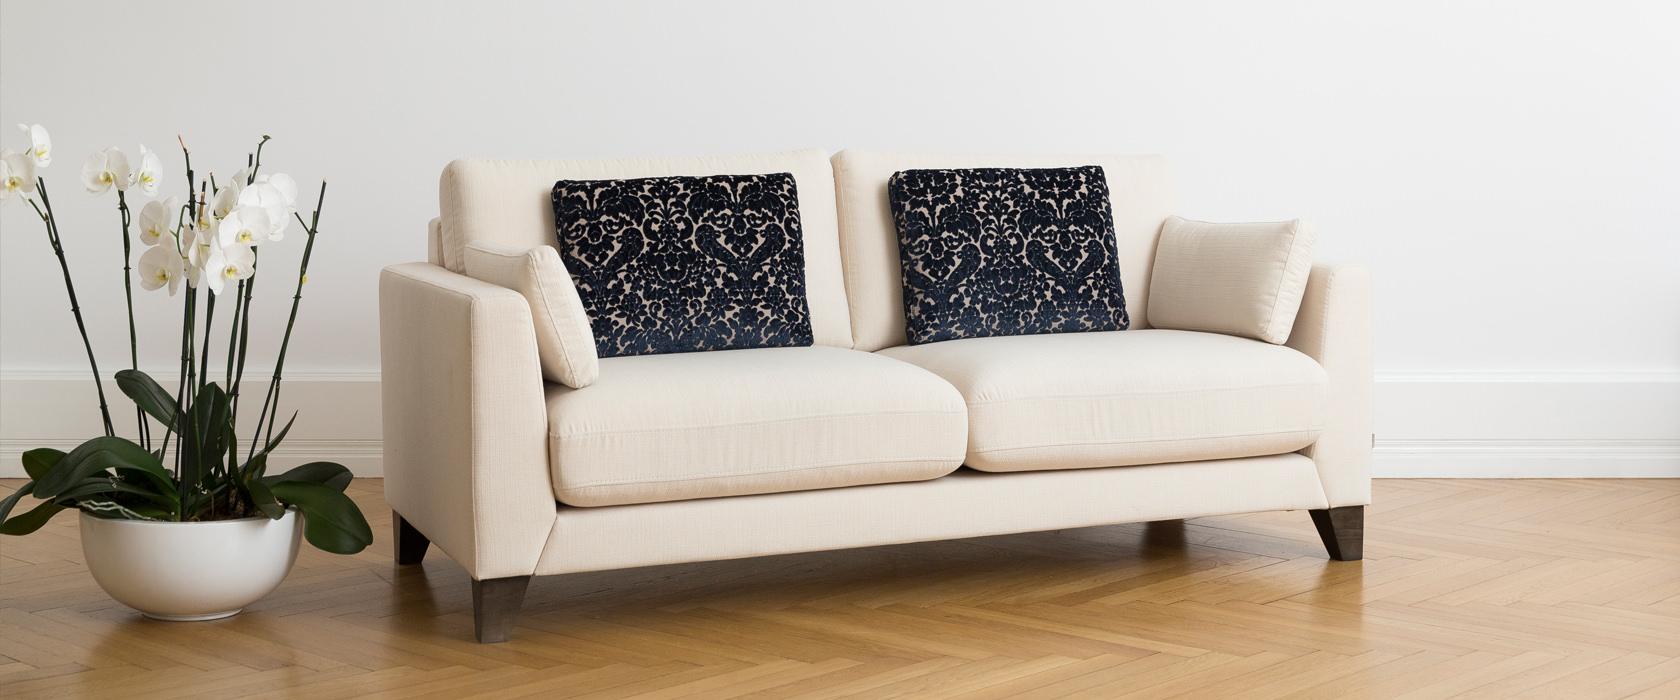 Двухместный диван Paolo - Фото 1 - Pufetto